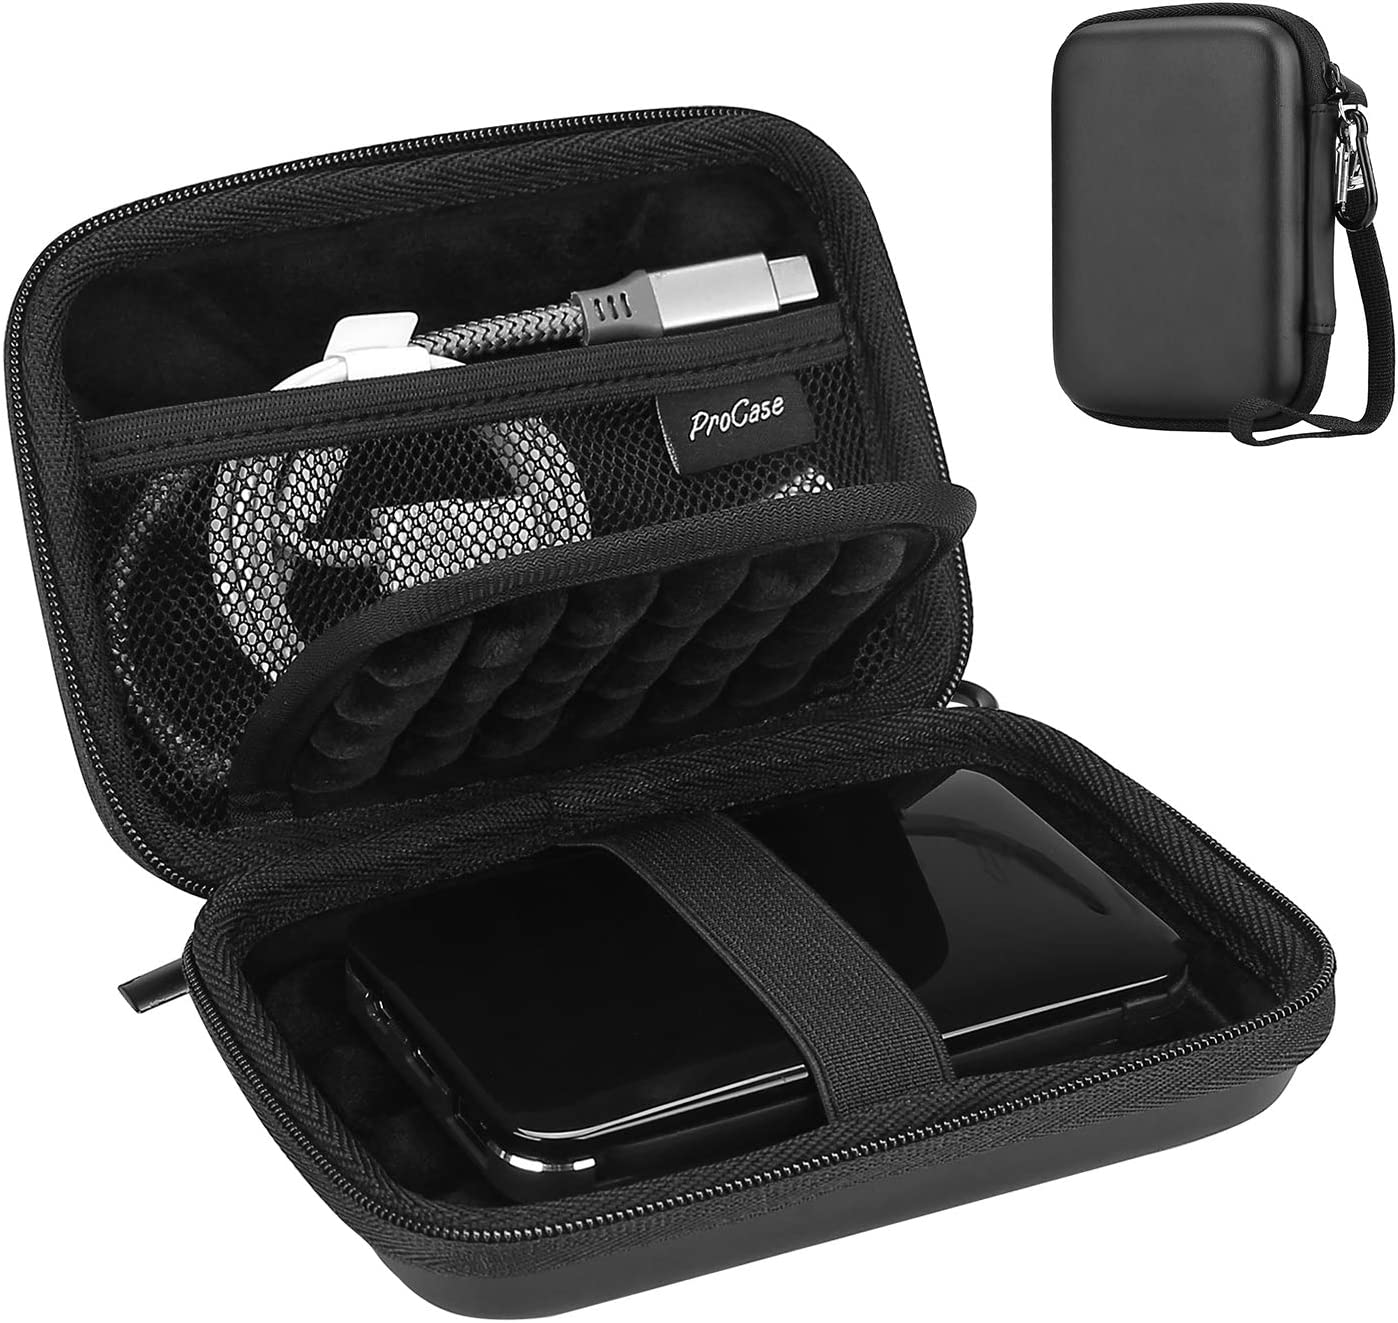 "Amazon.com: ProCase Portable Hard Drive Case for Canvio Basics Western  Digital WD Elements My Passport Seagate Portable Backup Plus Slim 1TB 2TB  3TB 4TB USB 3.0, 2.5"" Portable External Hard Drive Case -"